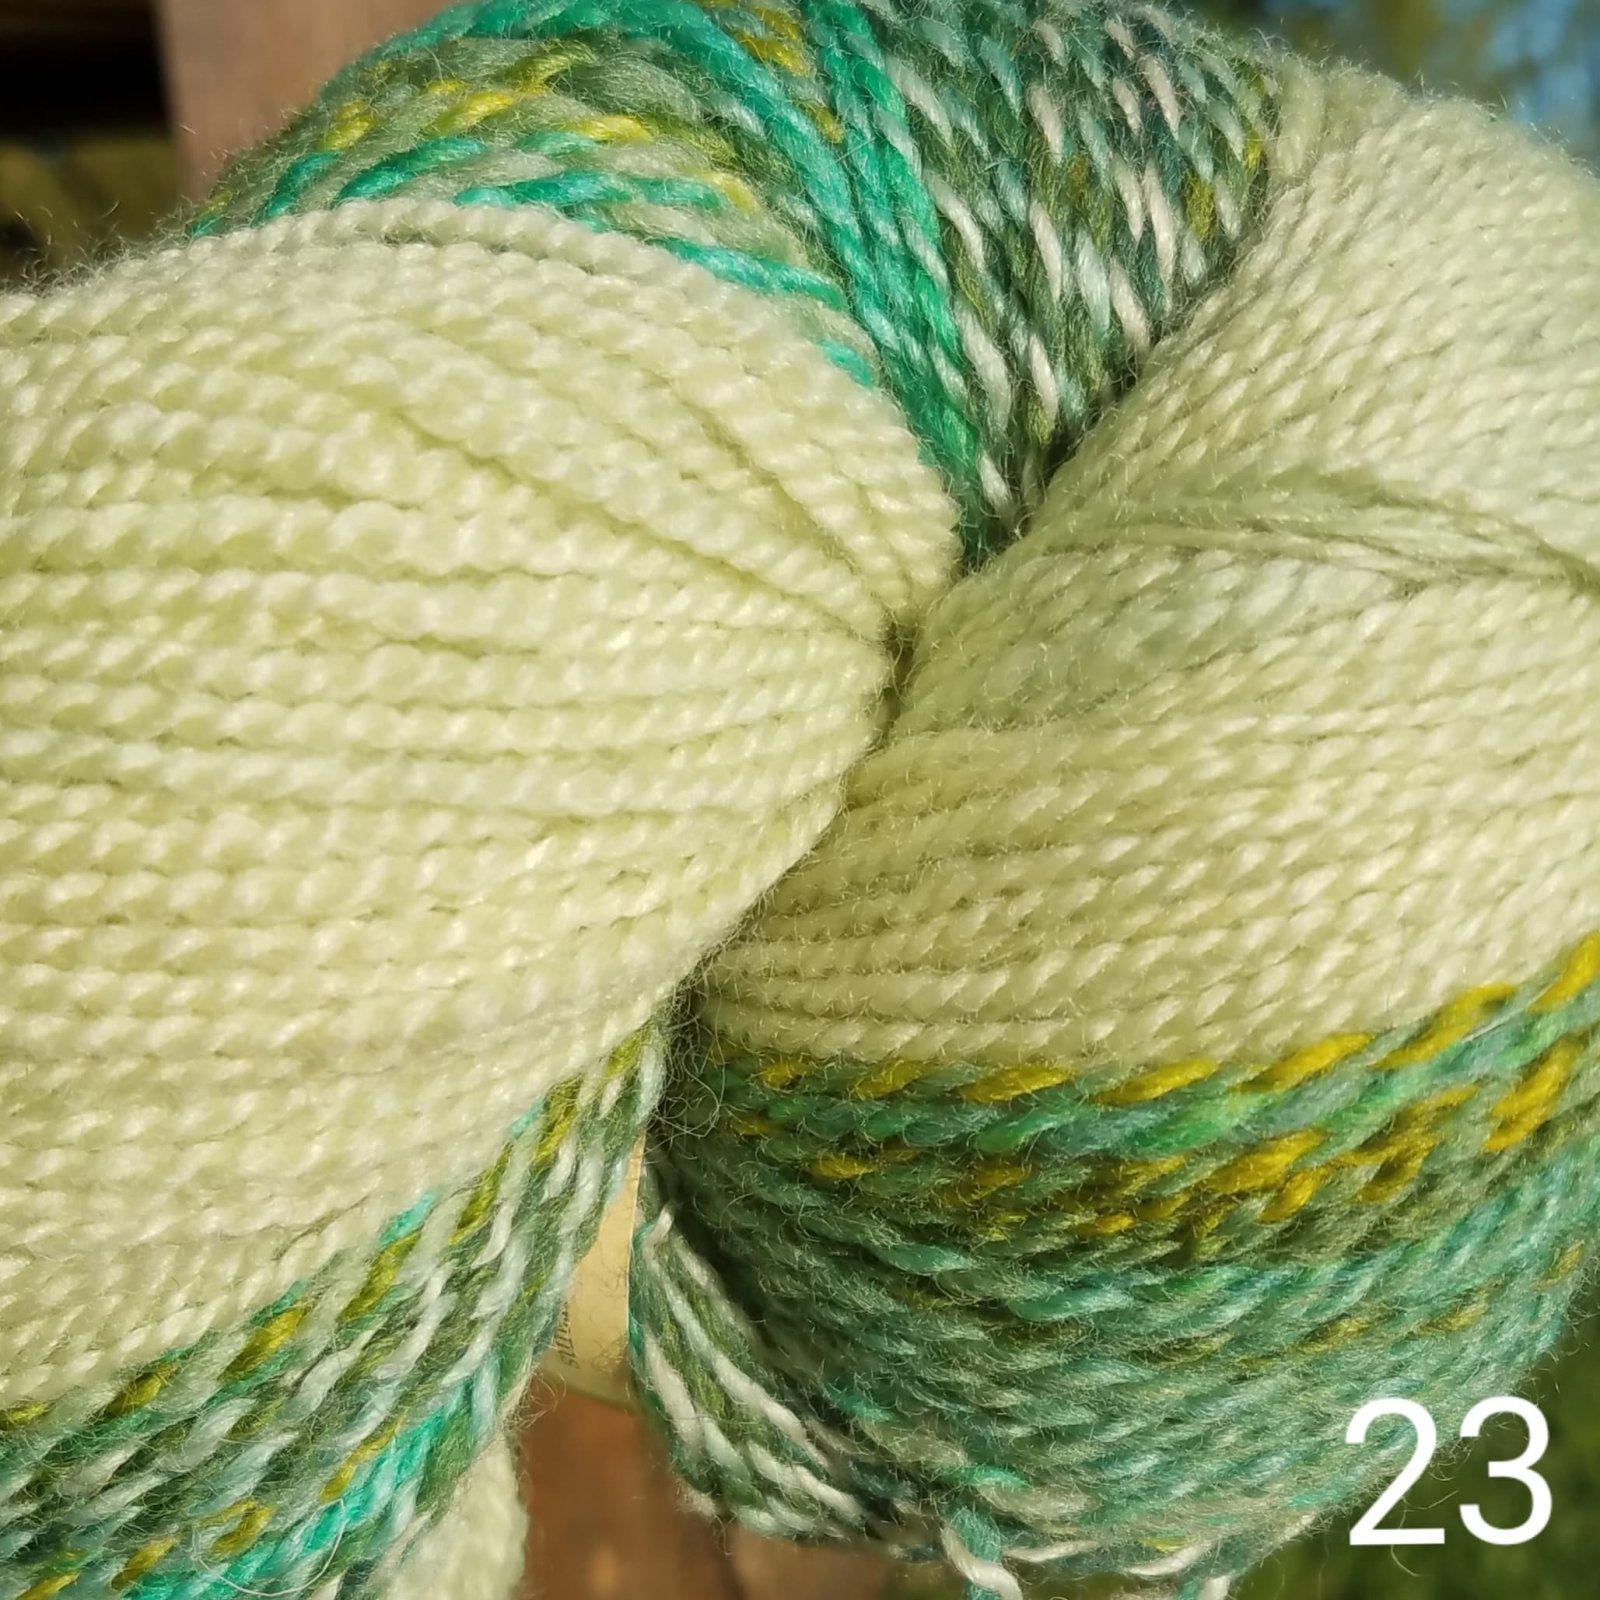 Yarn Bundle 23